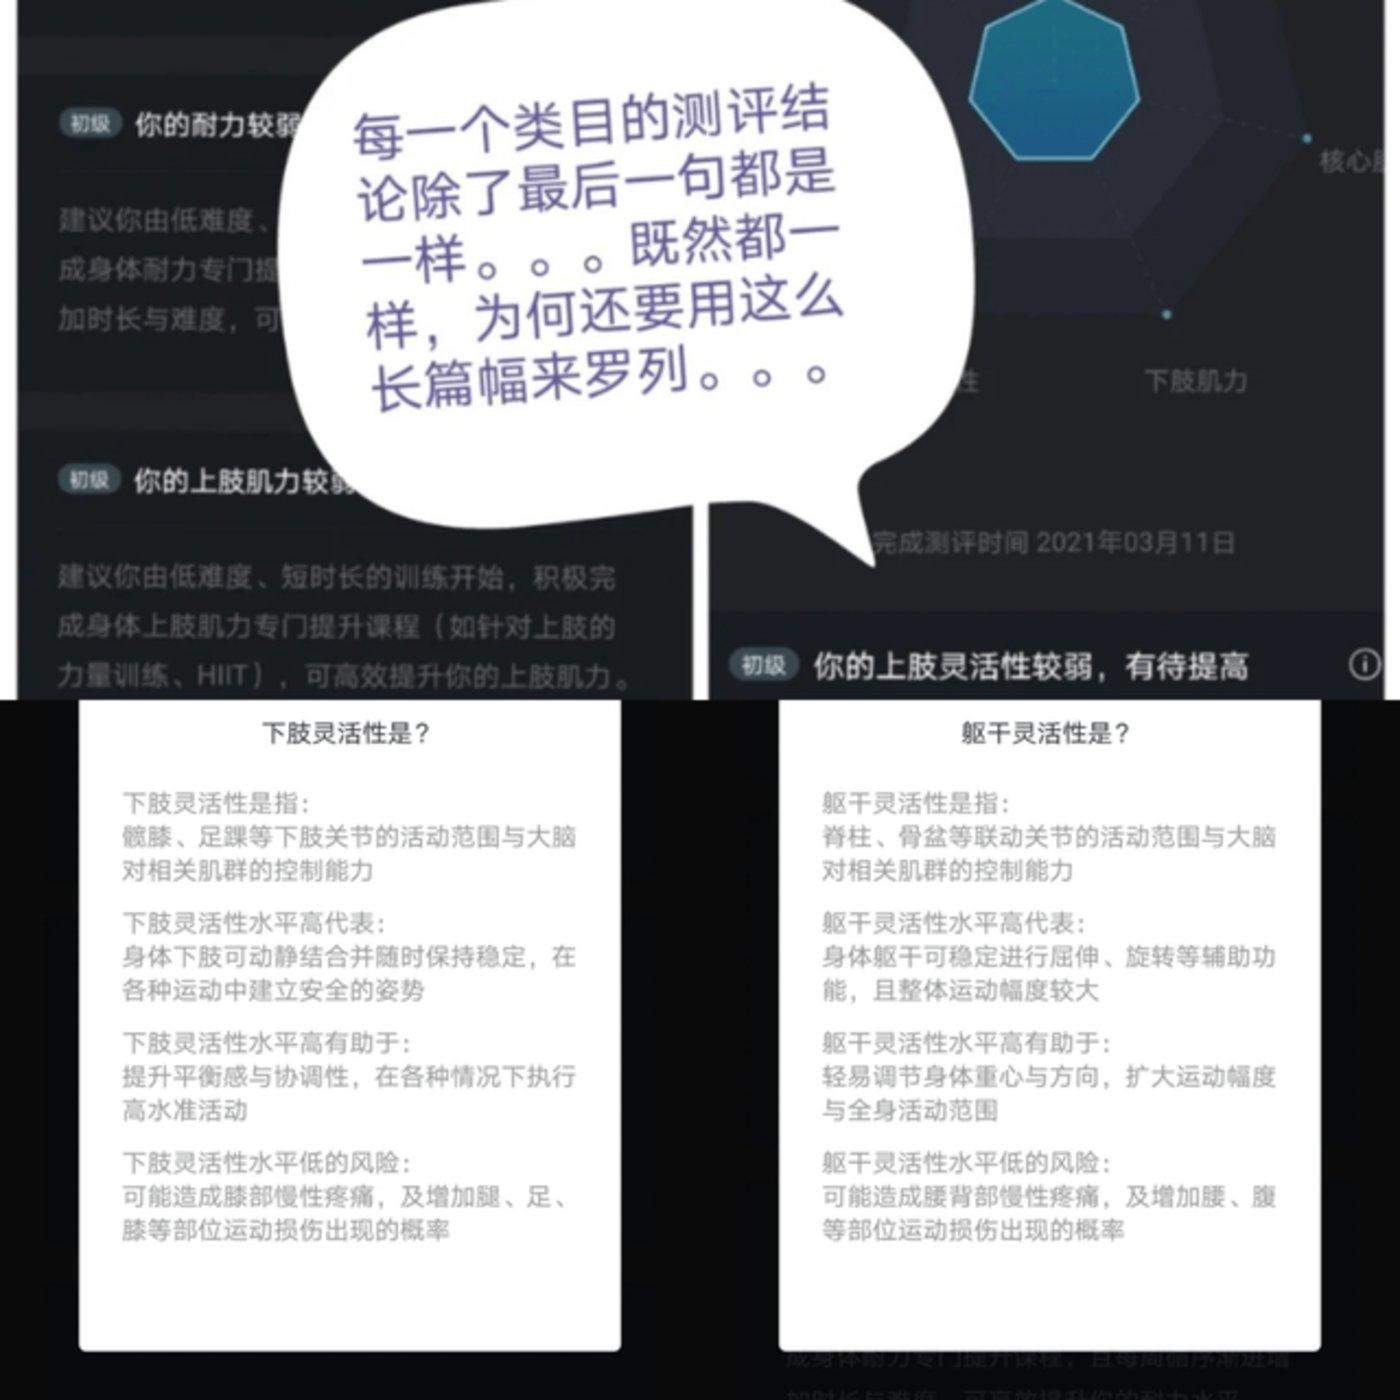 Mack发布的FITURE魔镜AI评测结果 图源 / 小红书